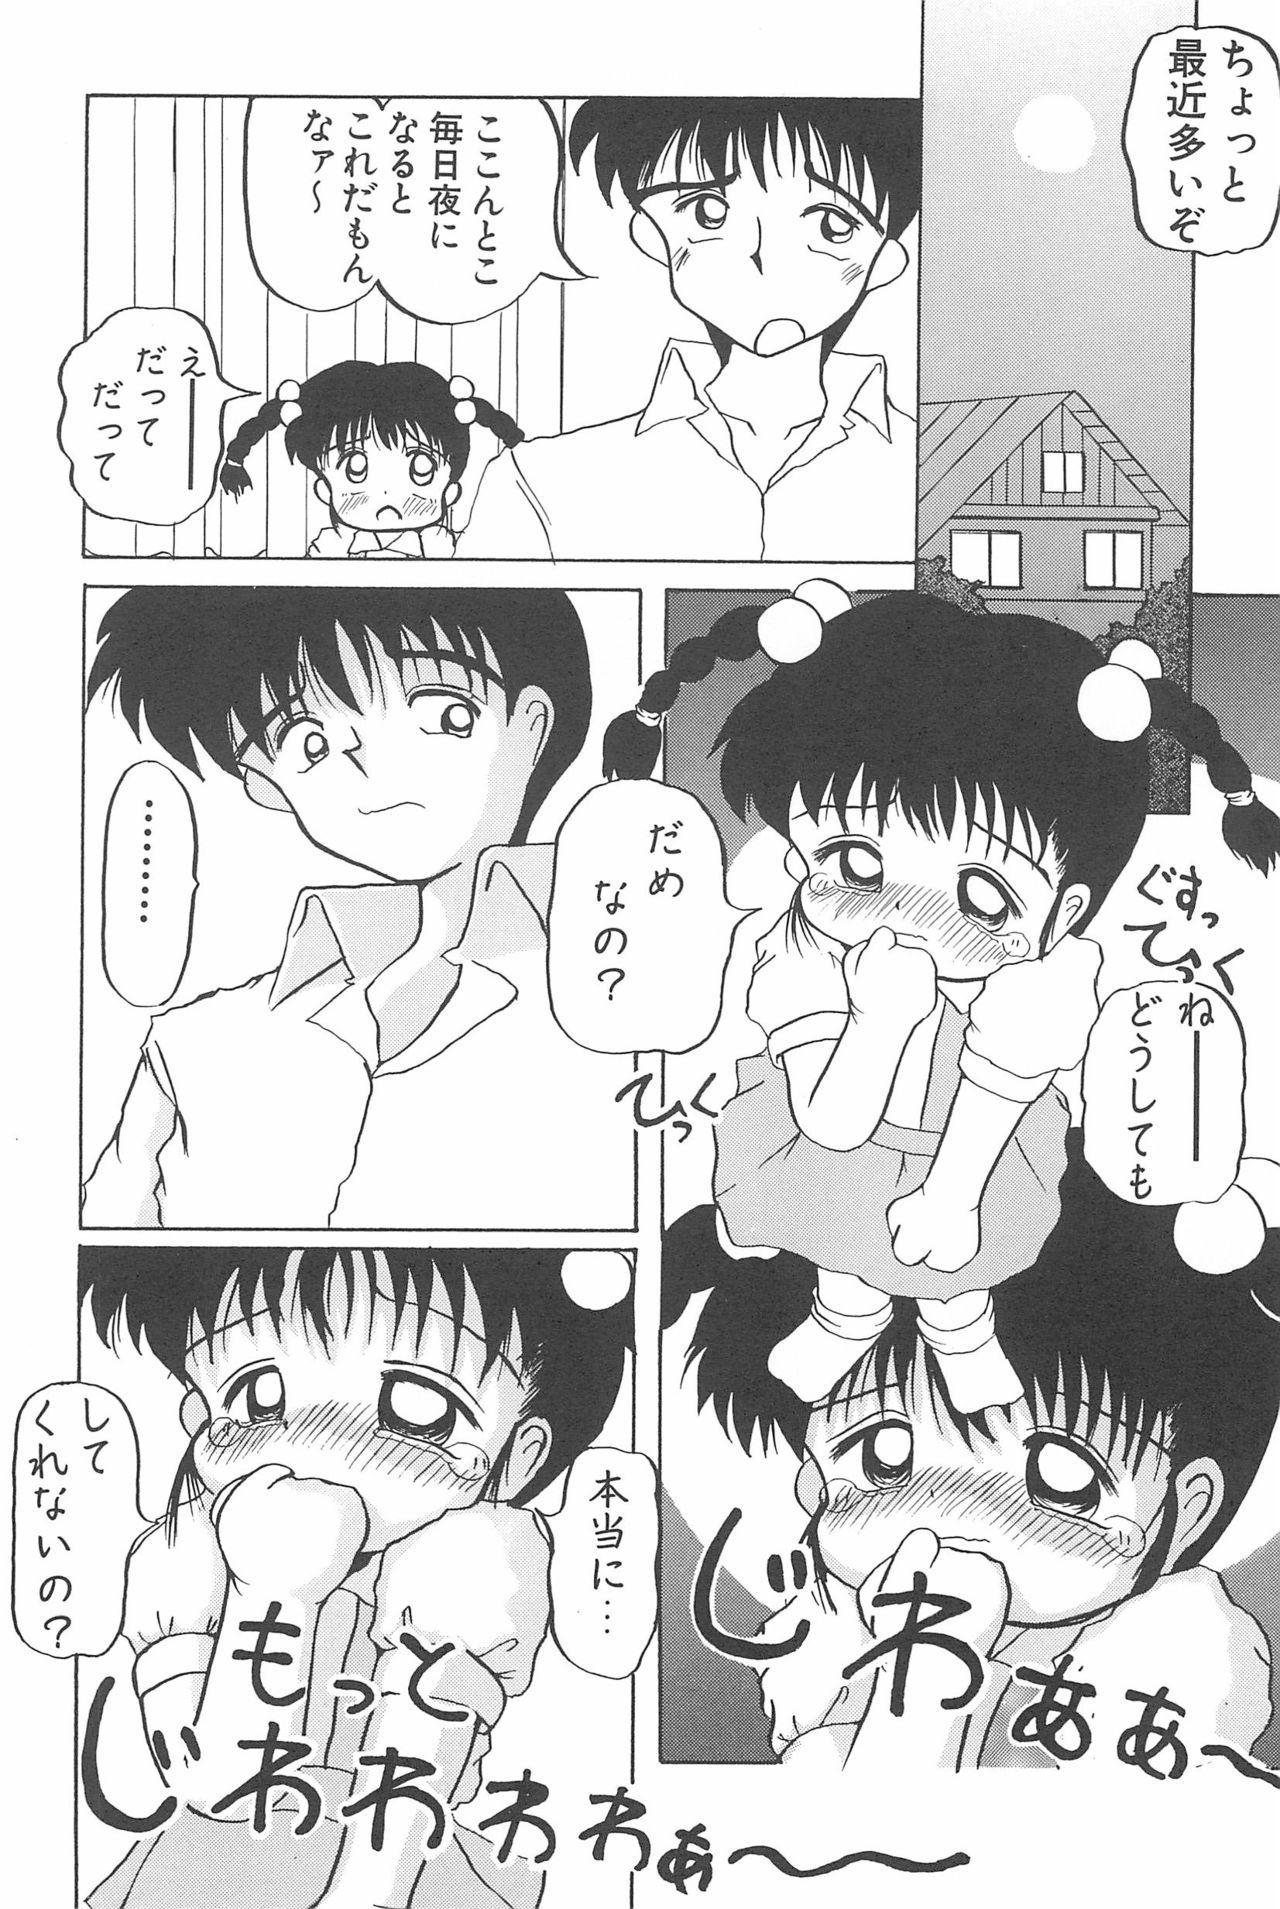 Aoi Shojokyuu 143